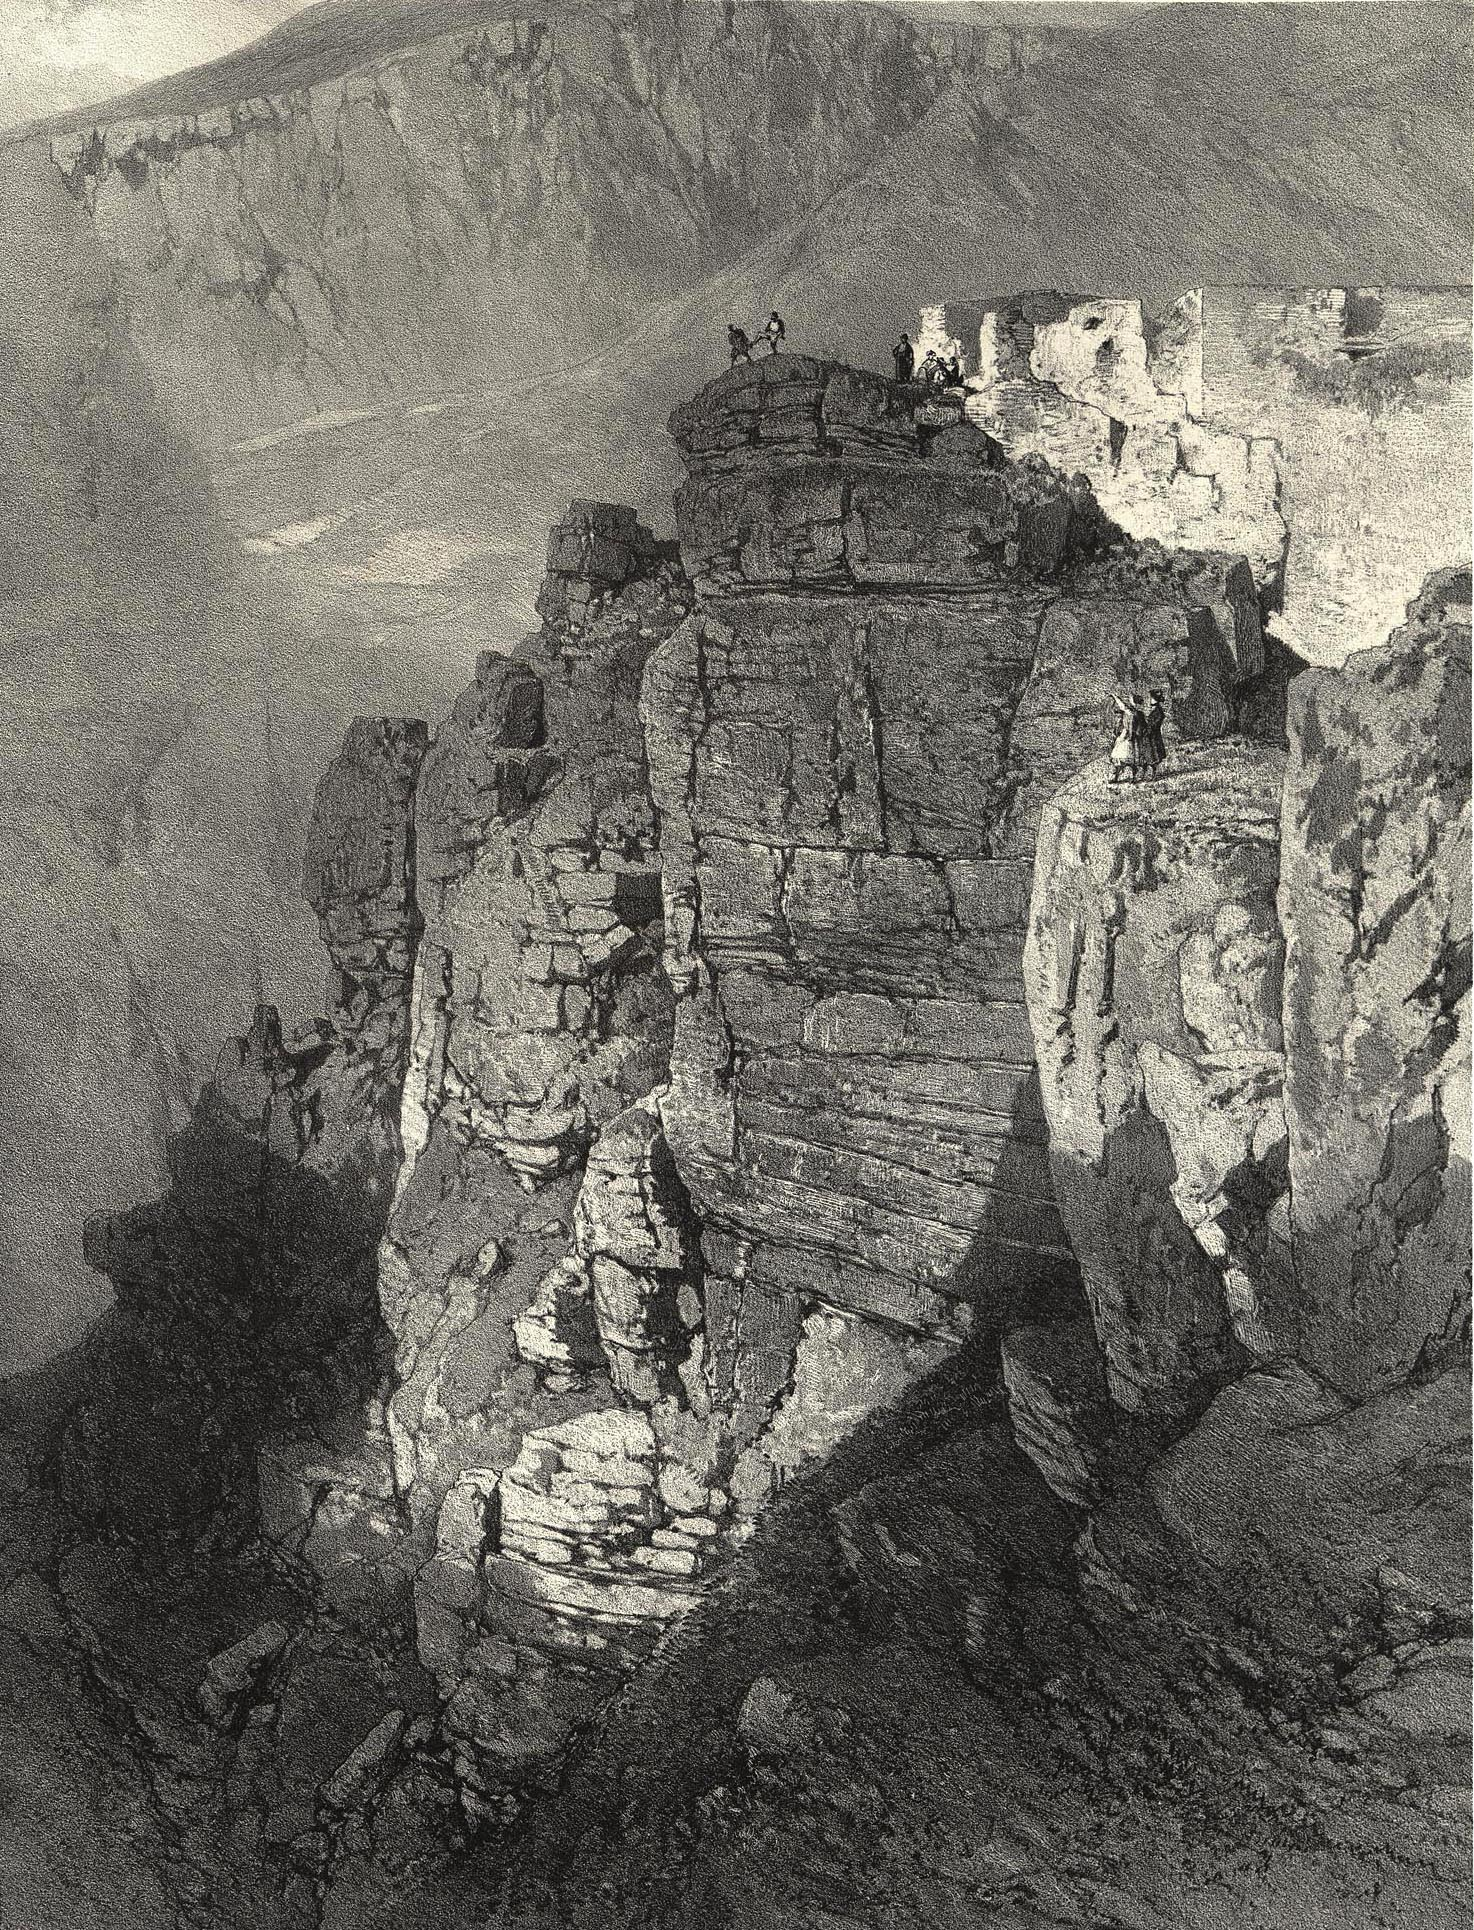 71. Daghestan. Rocher a Khounzak en Avarie / Дагестан. Скала Хунзах в Аварии